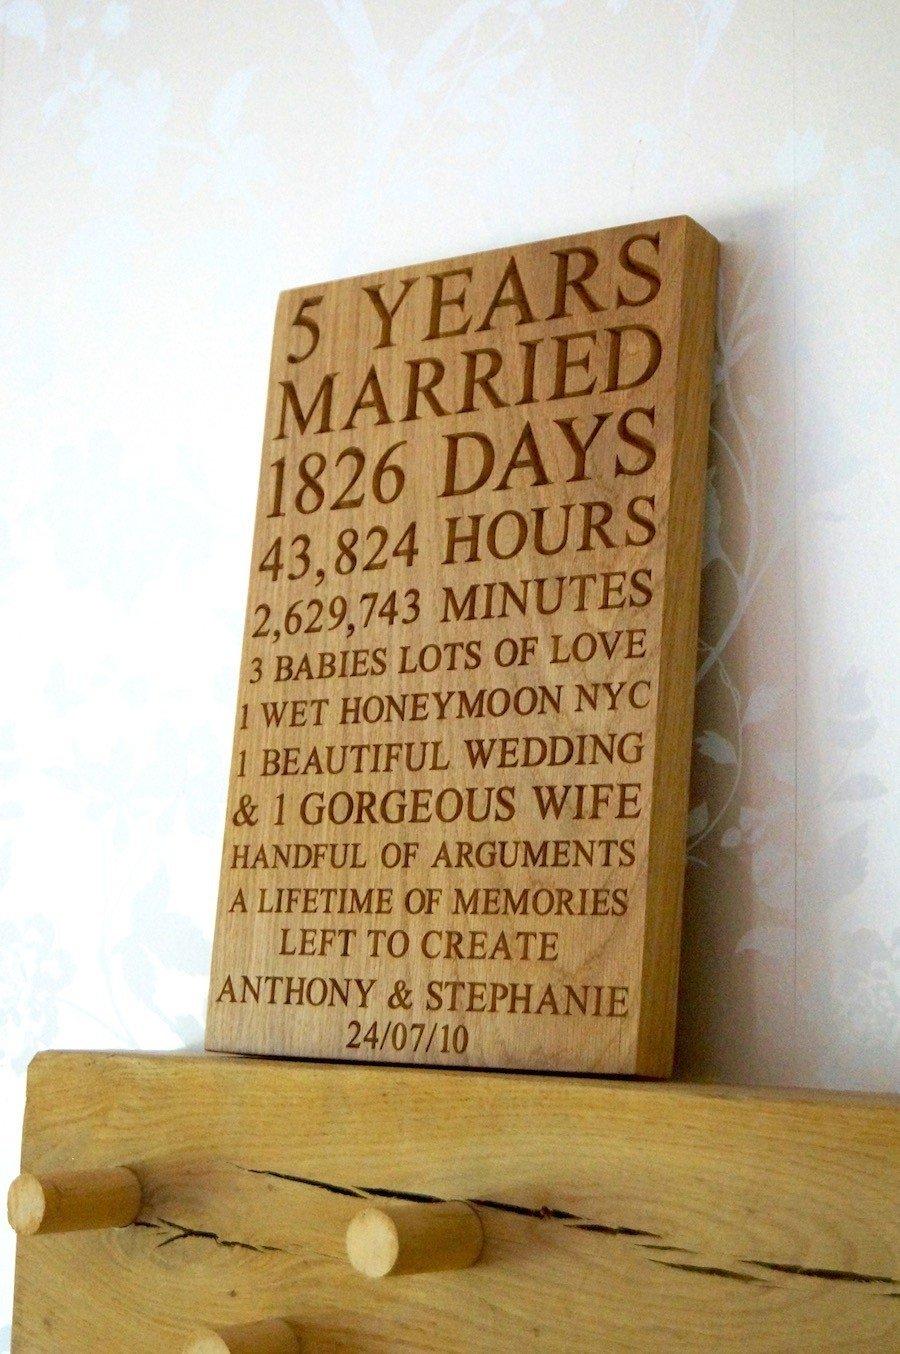 10 Stunning 5 Year Anniversary Ideas For Him wedding anniversary 5 years gift ideas best of 5th wedding 1 2020